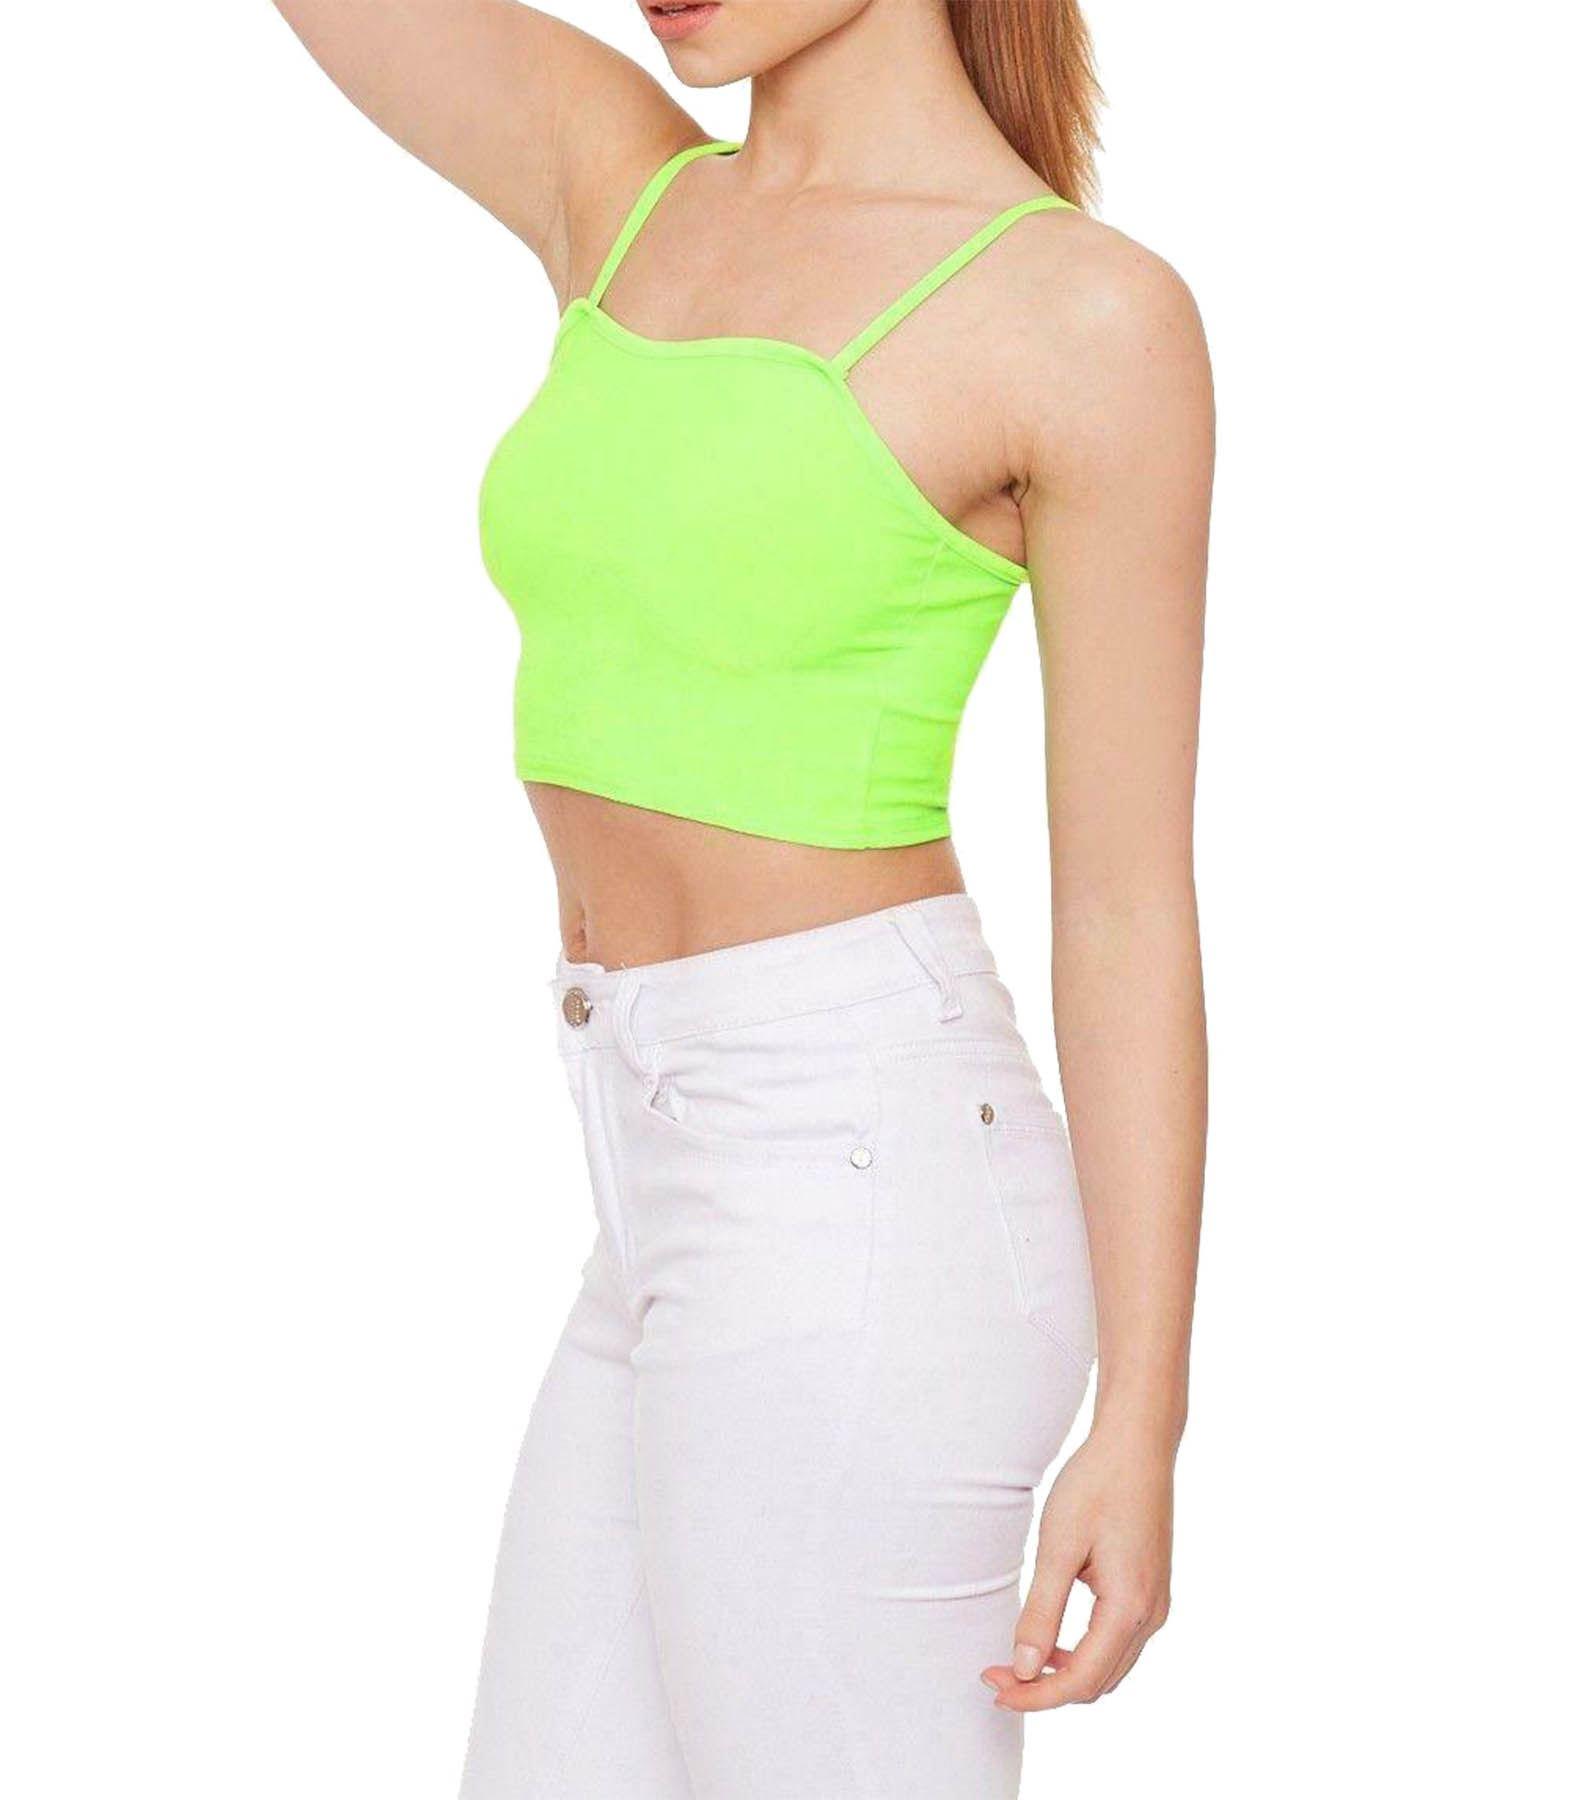 Women's Plain Strappy Sleeveless Cropped Vest Top Bralet Gym